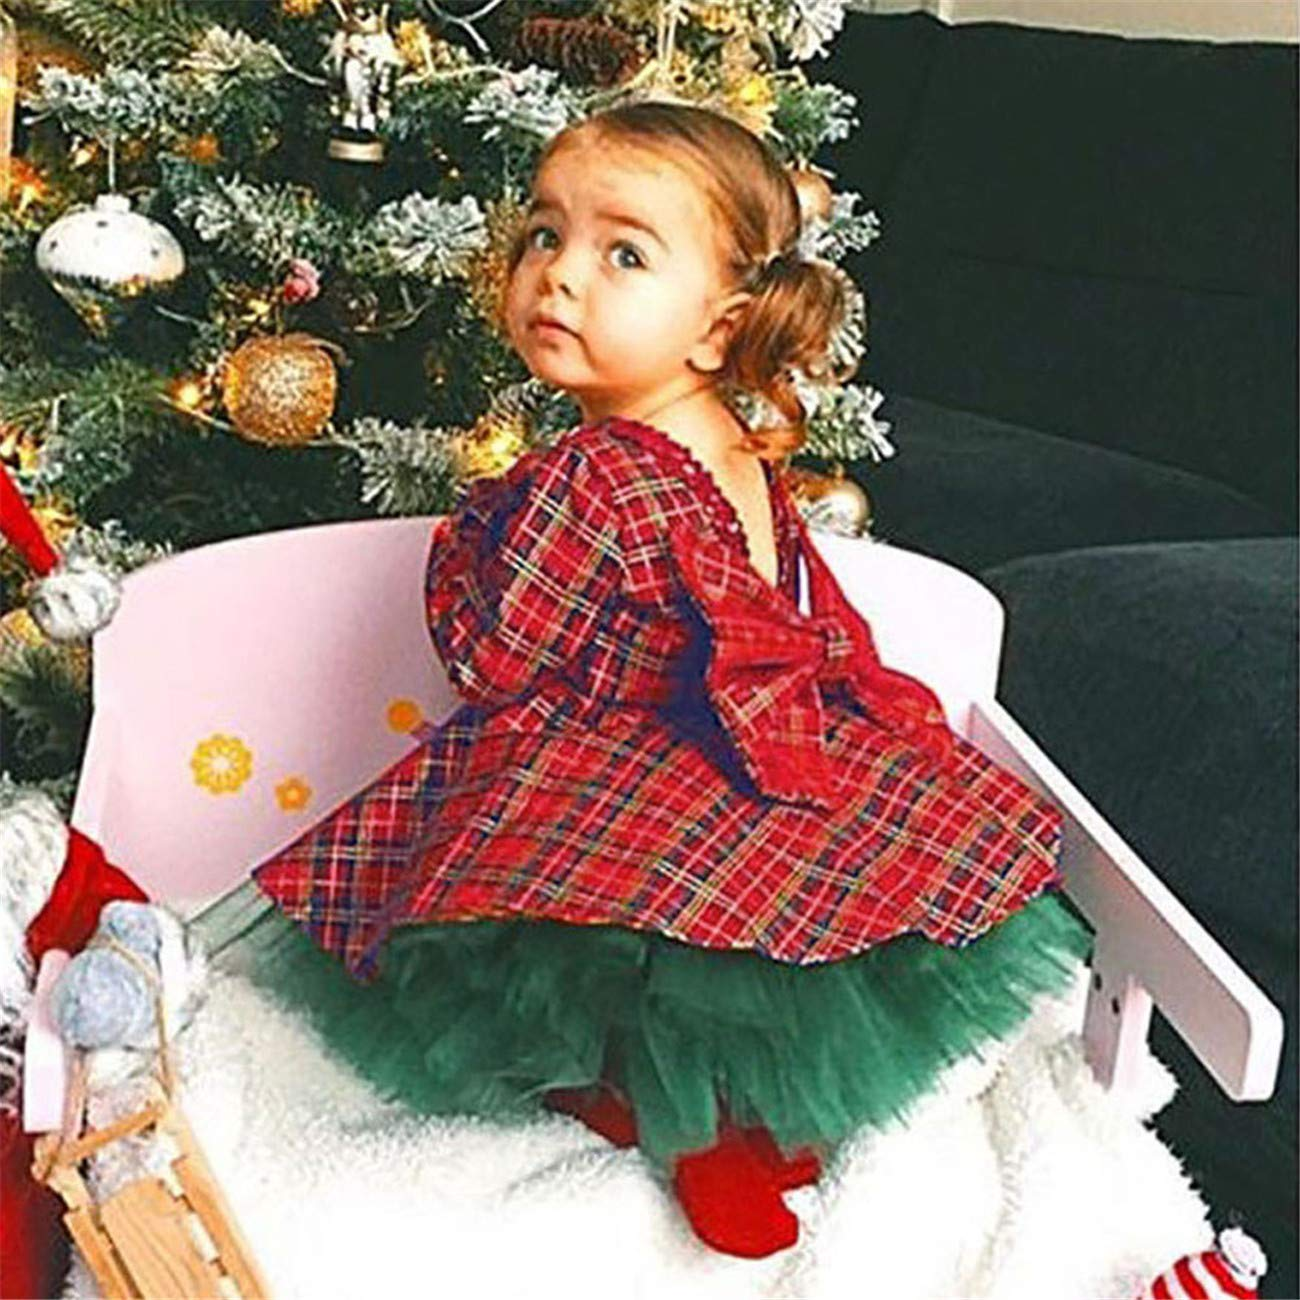 HCFKJ Ropa Bebe NiñA Invierno NiñO Manga Larga Camisetas Beb Conjuntos Moda Infantil Baby NiñA Princesa Arco Plaid Vestido Tapas Tutu Tul Faldas 2pcs: ...